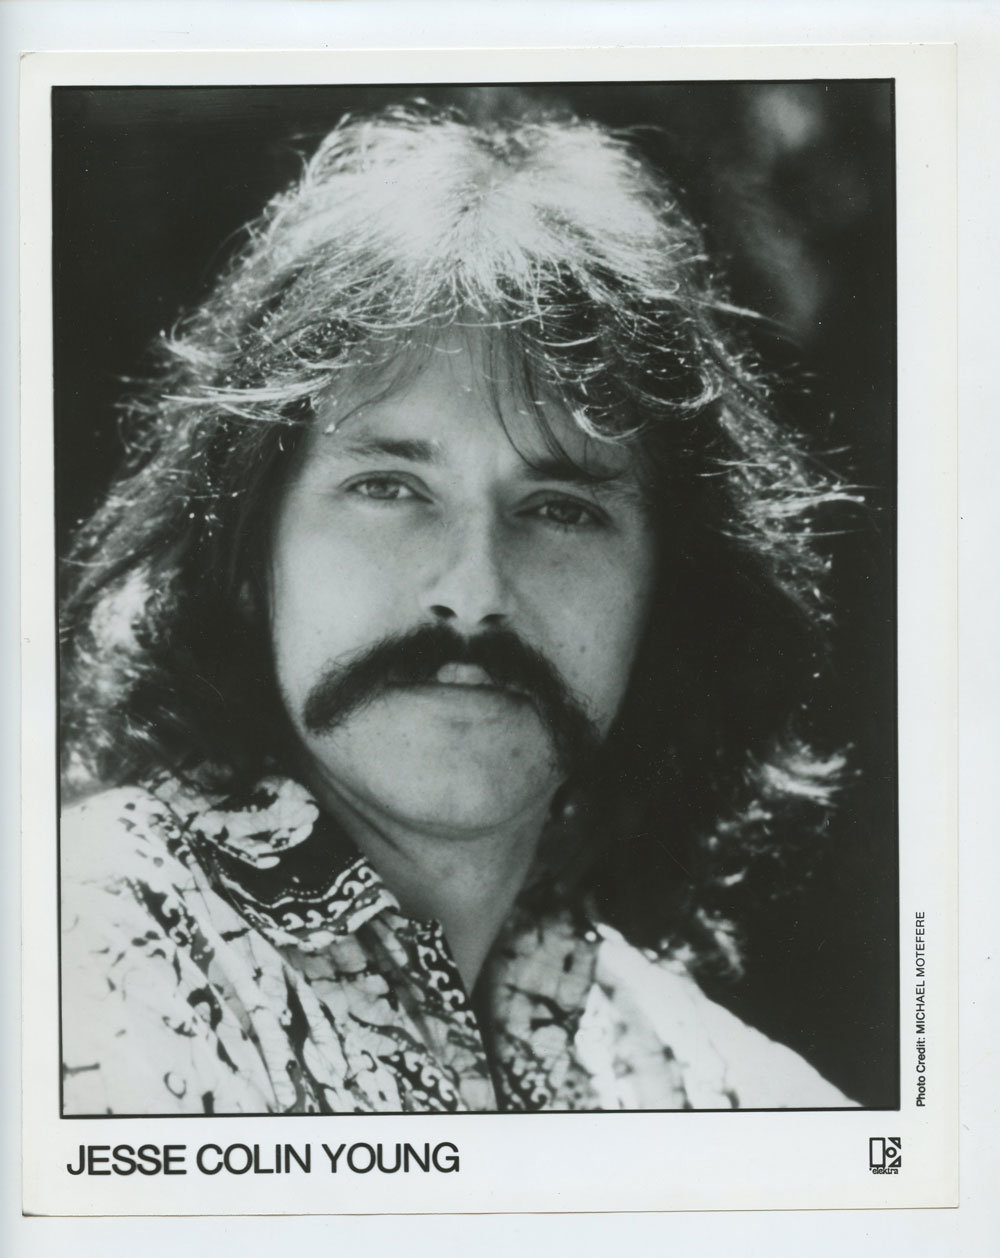 Jesse Colin Young Photo 1978 Publicity Promo Elektra Records